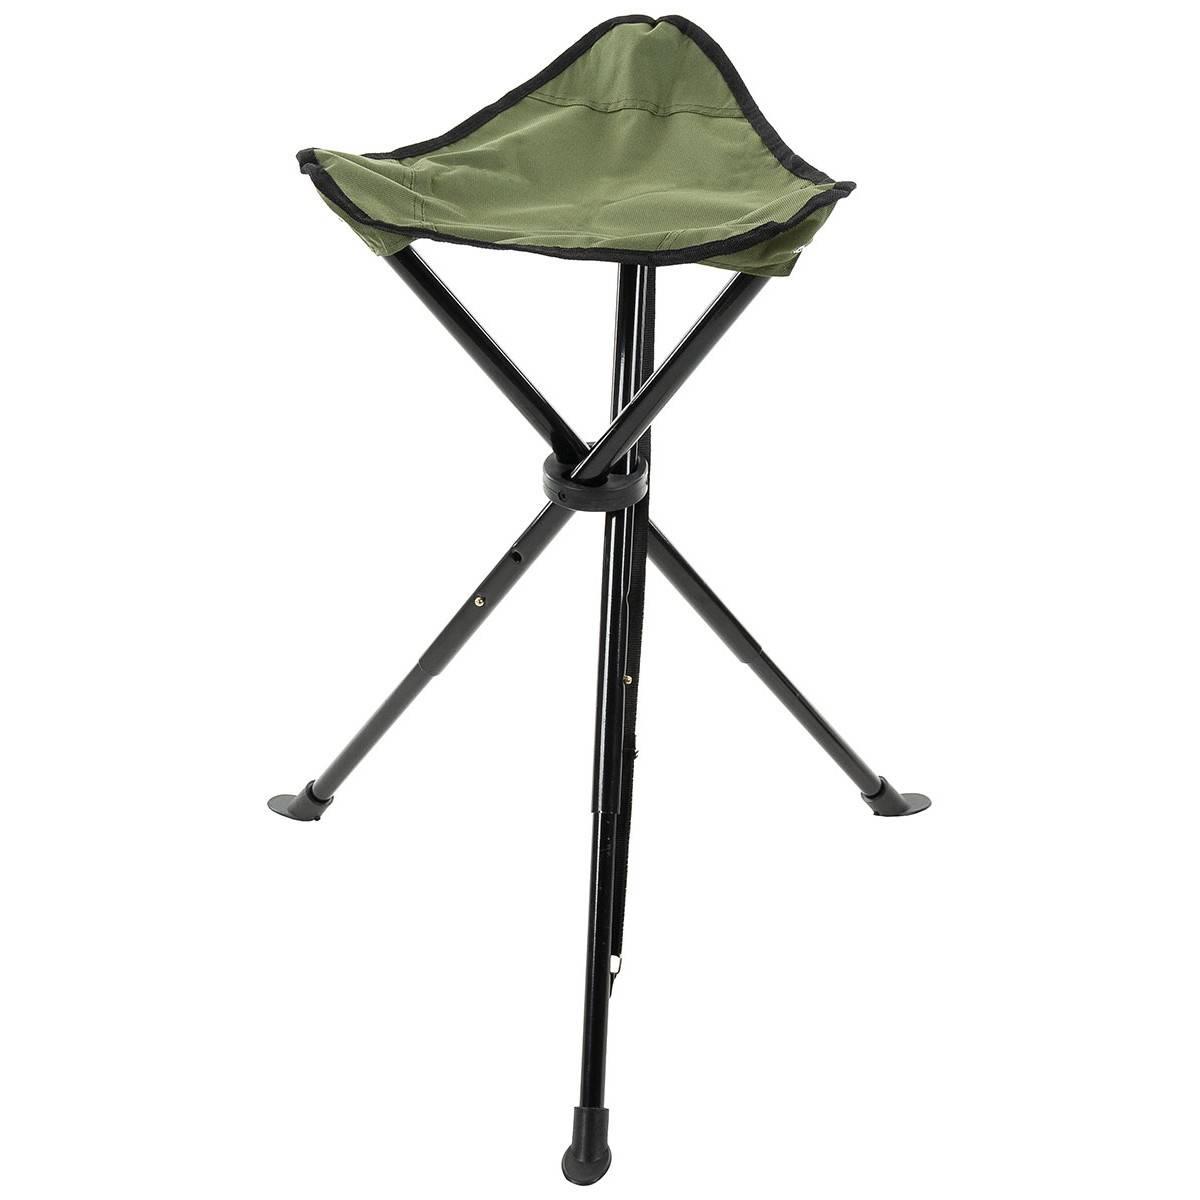 Folding Chair 3 Leg Telescope Od Green